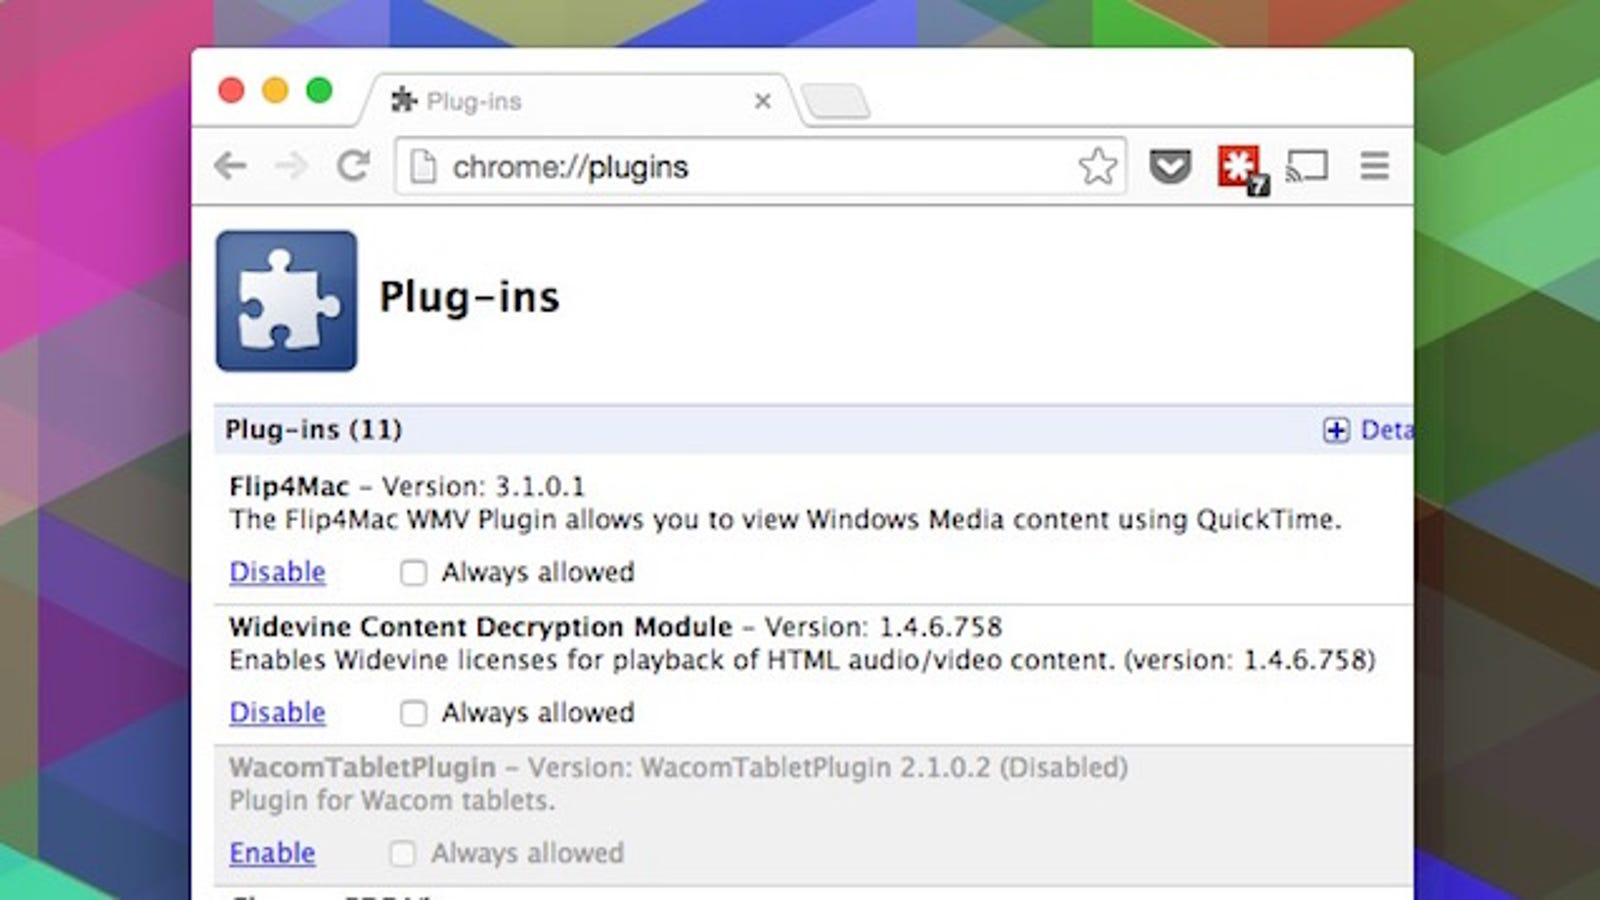 chrome://plugins/